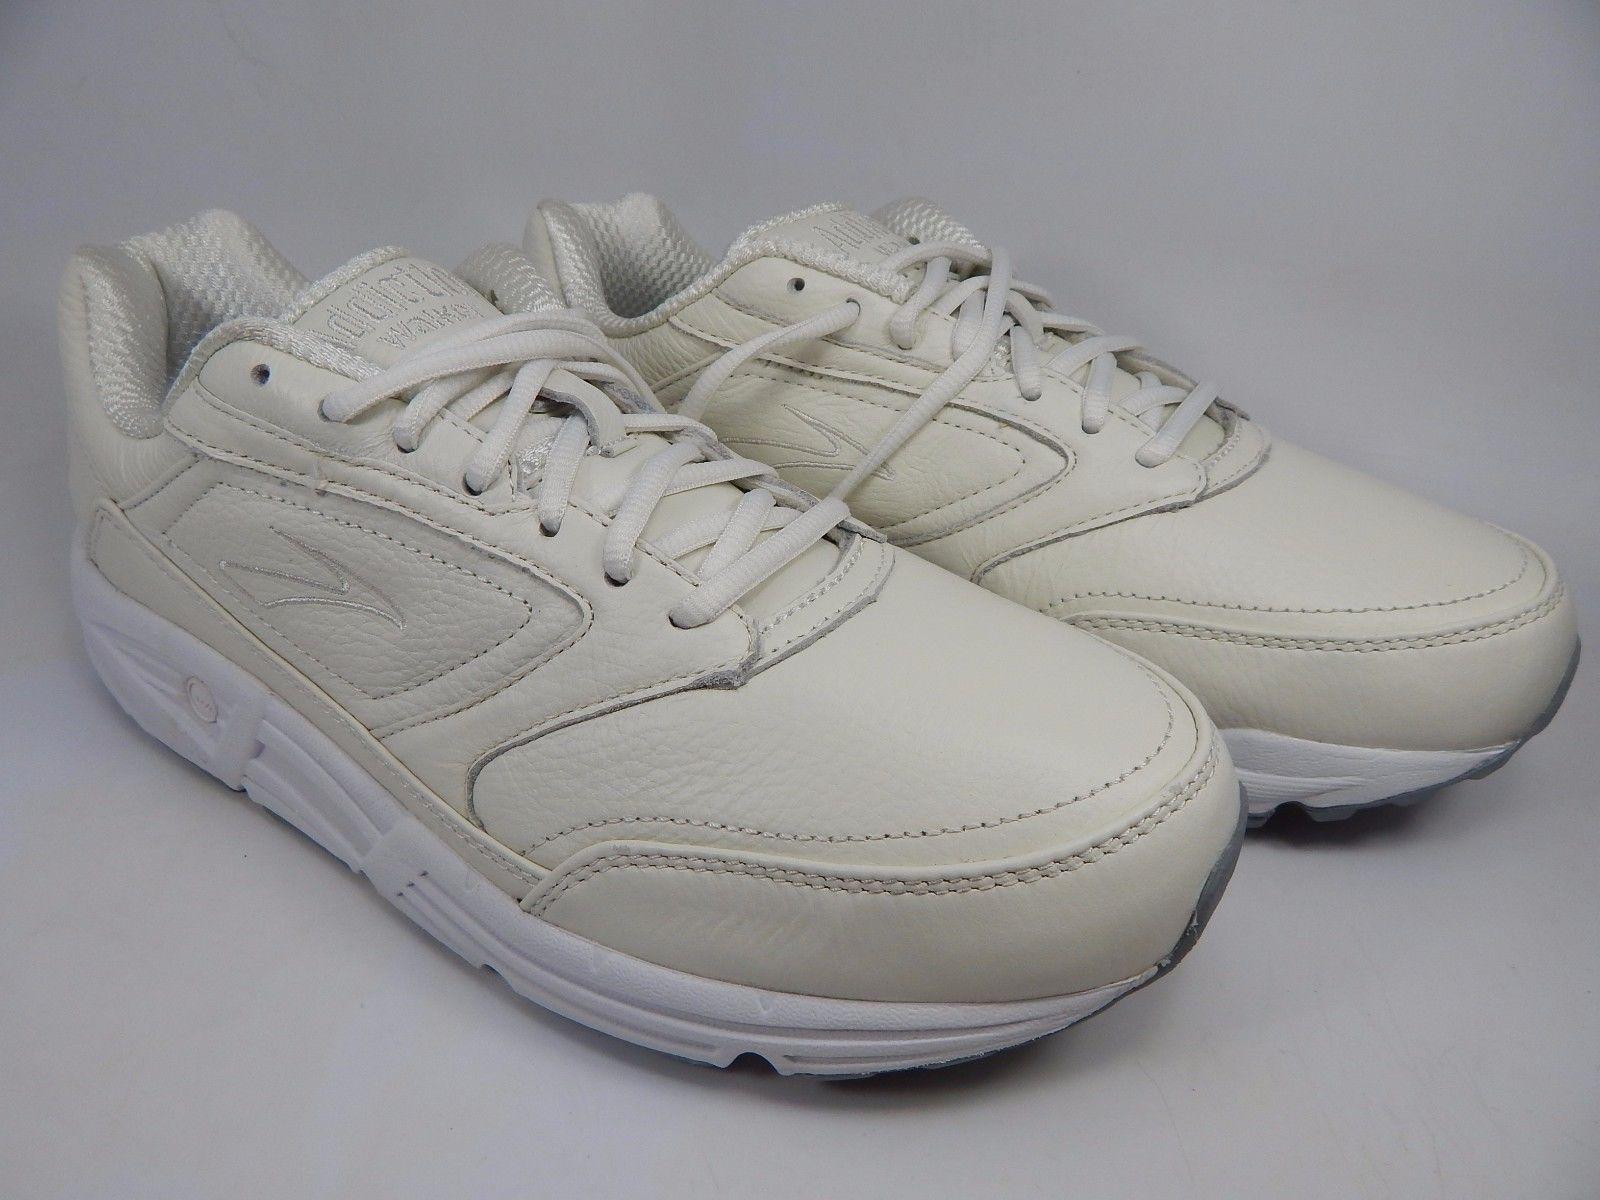 97c08263849 Brooks Addiction Walker Men s Walking Shoes and 50 similar items. 57